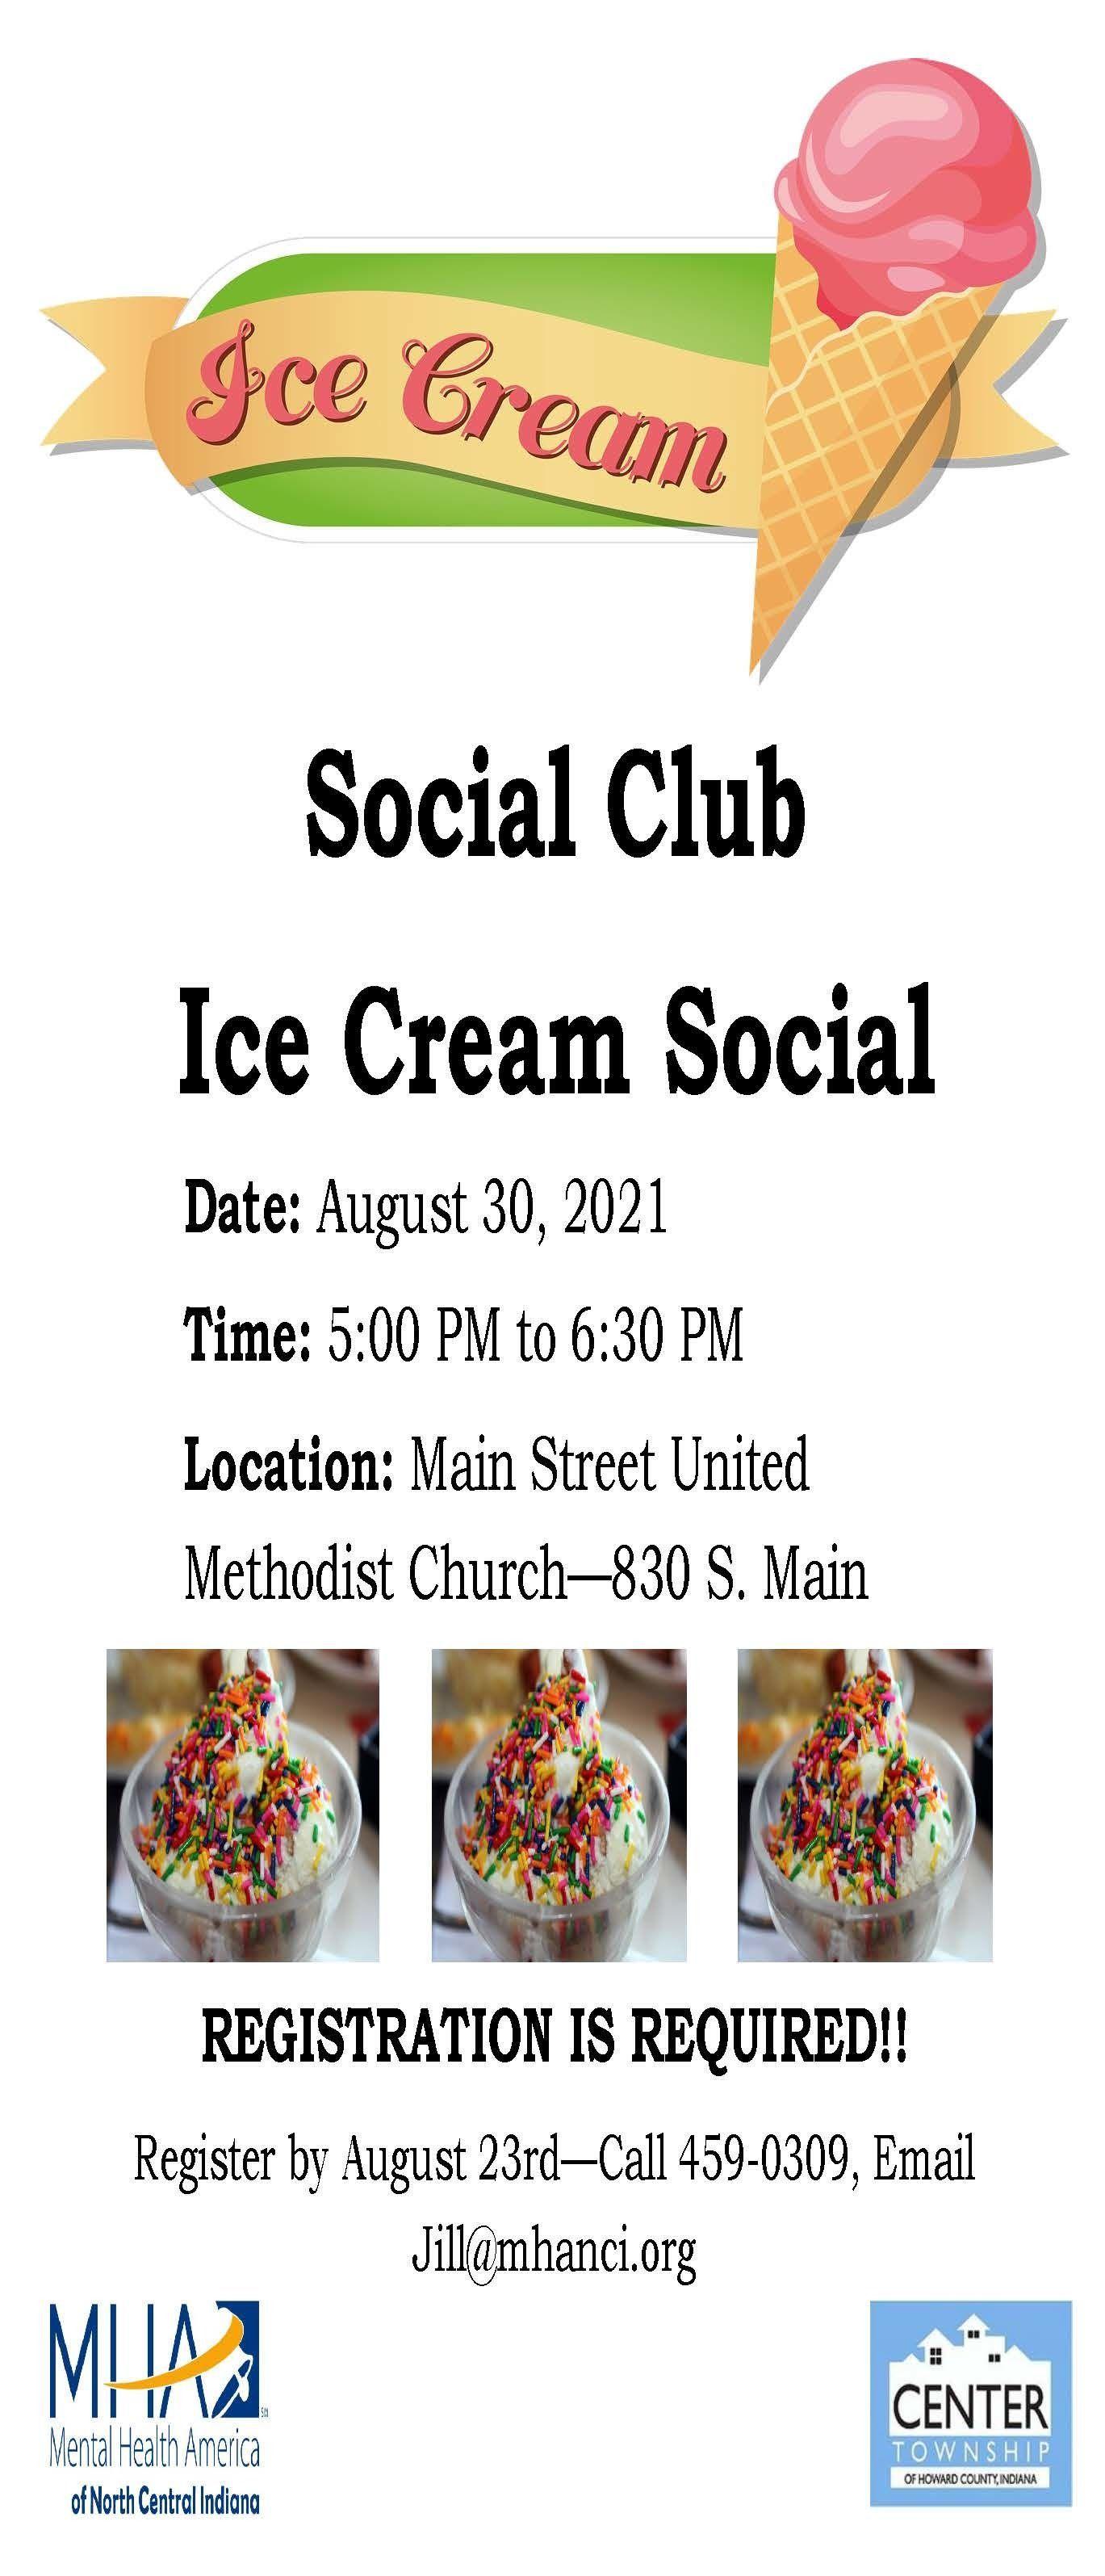 Social Club - Ice Cream Social